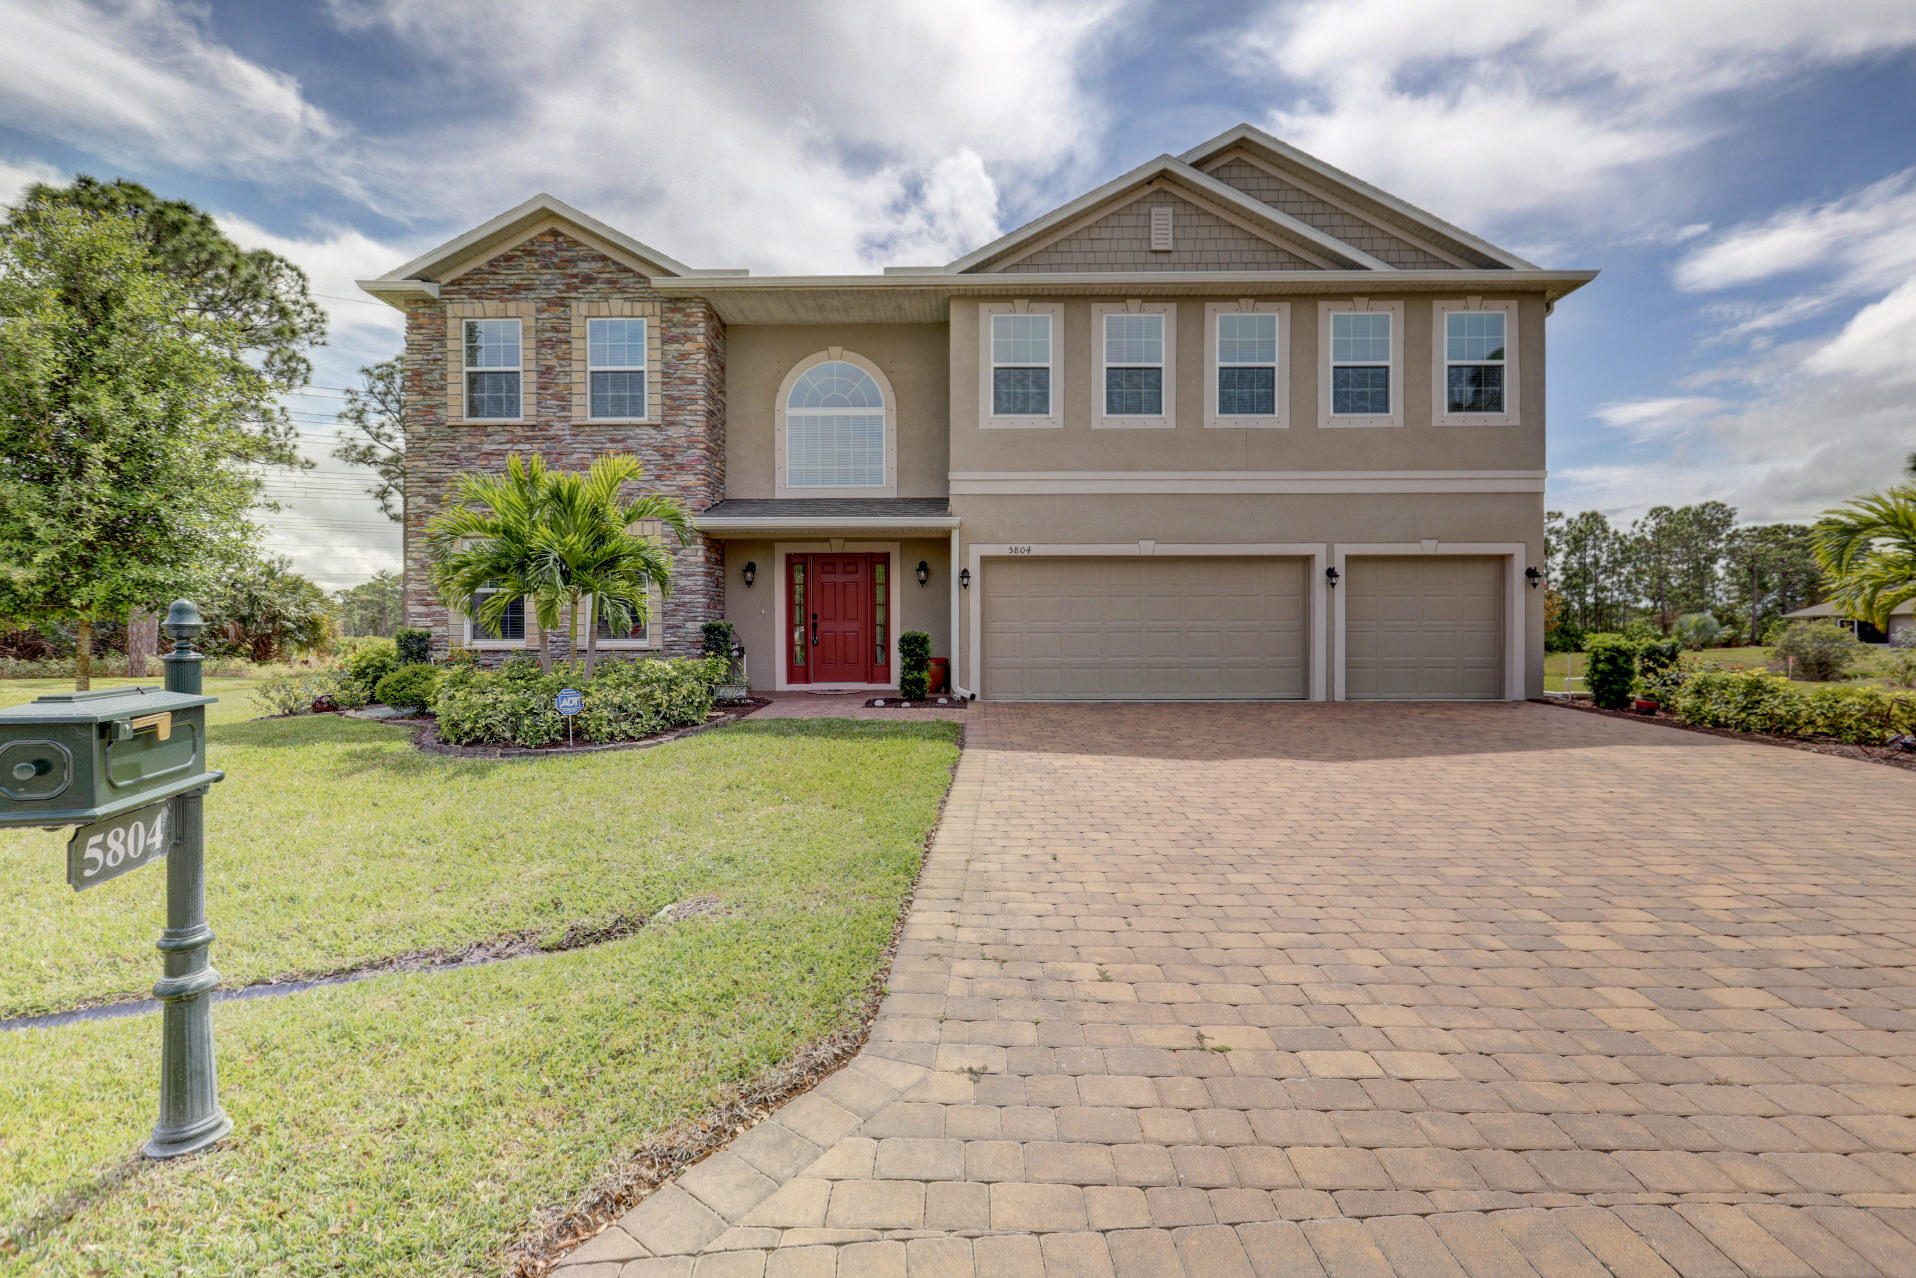 5804 NW Tree House Court, Port Saint Lucie, Florida